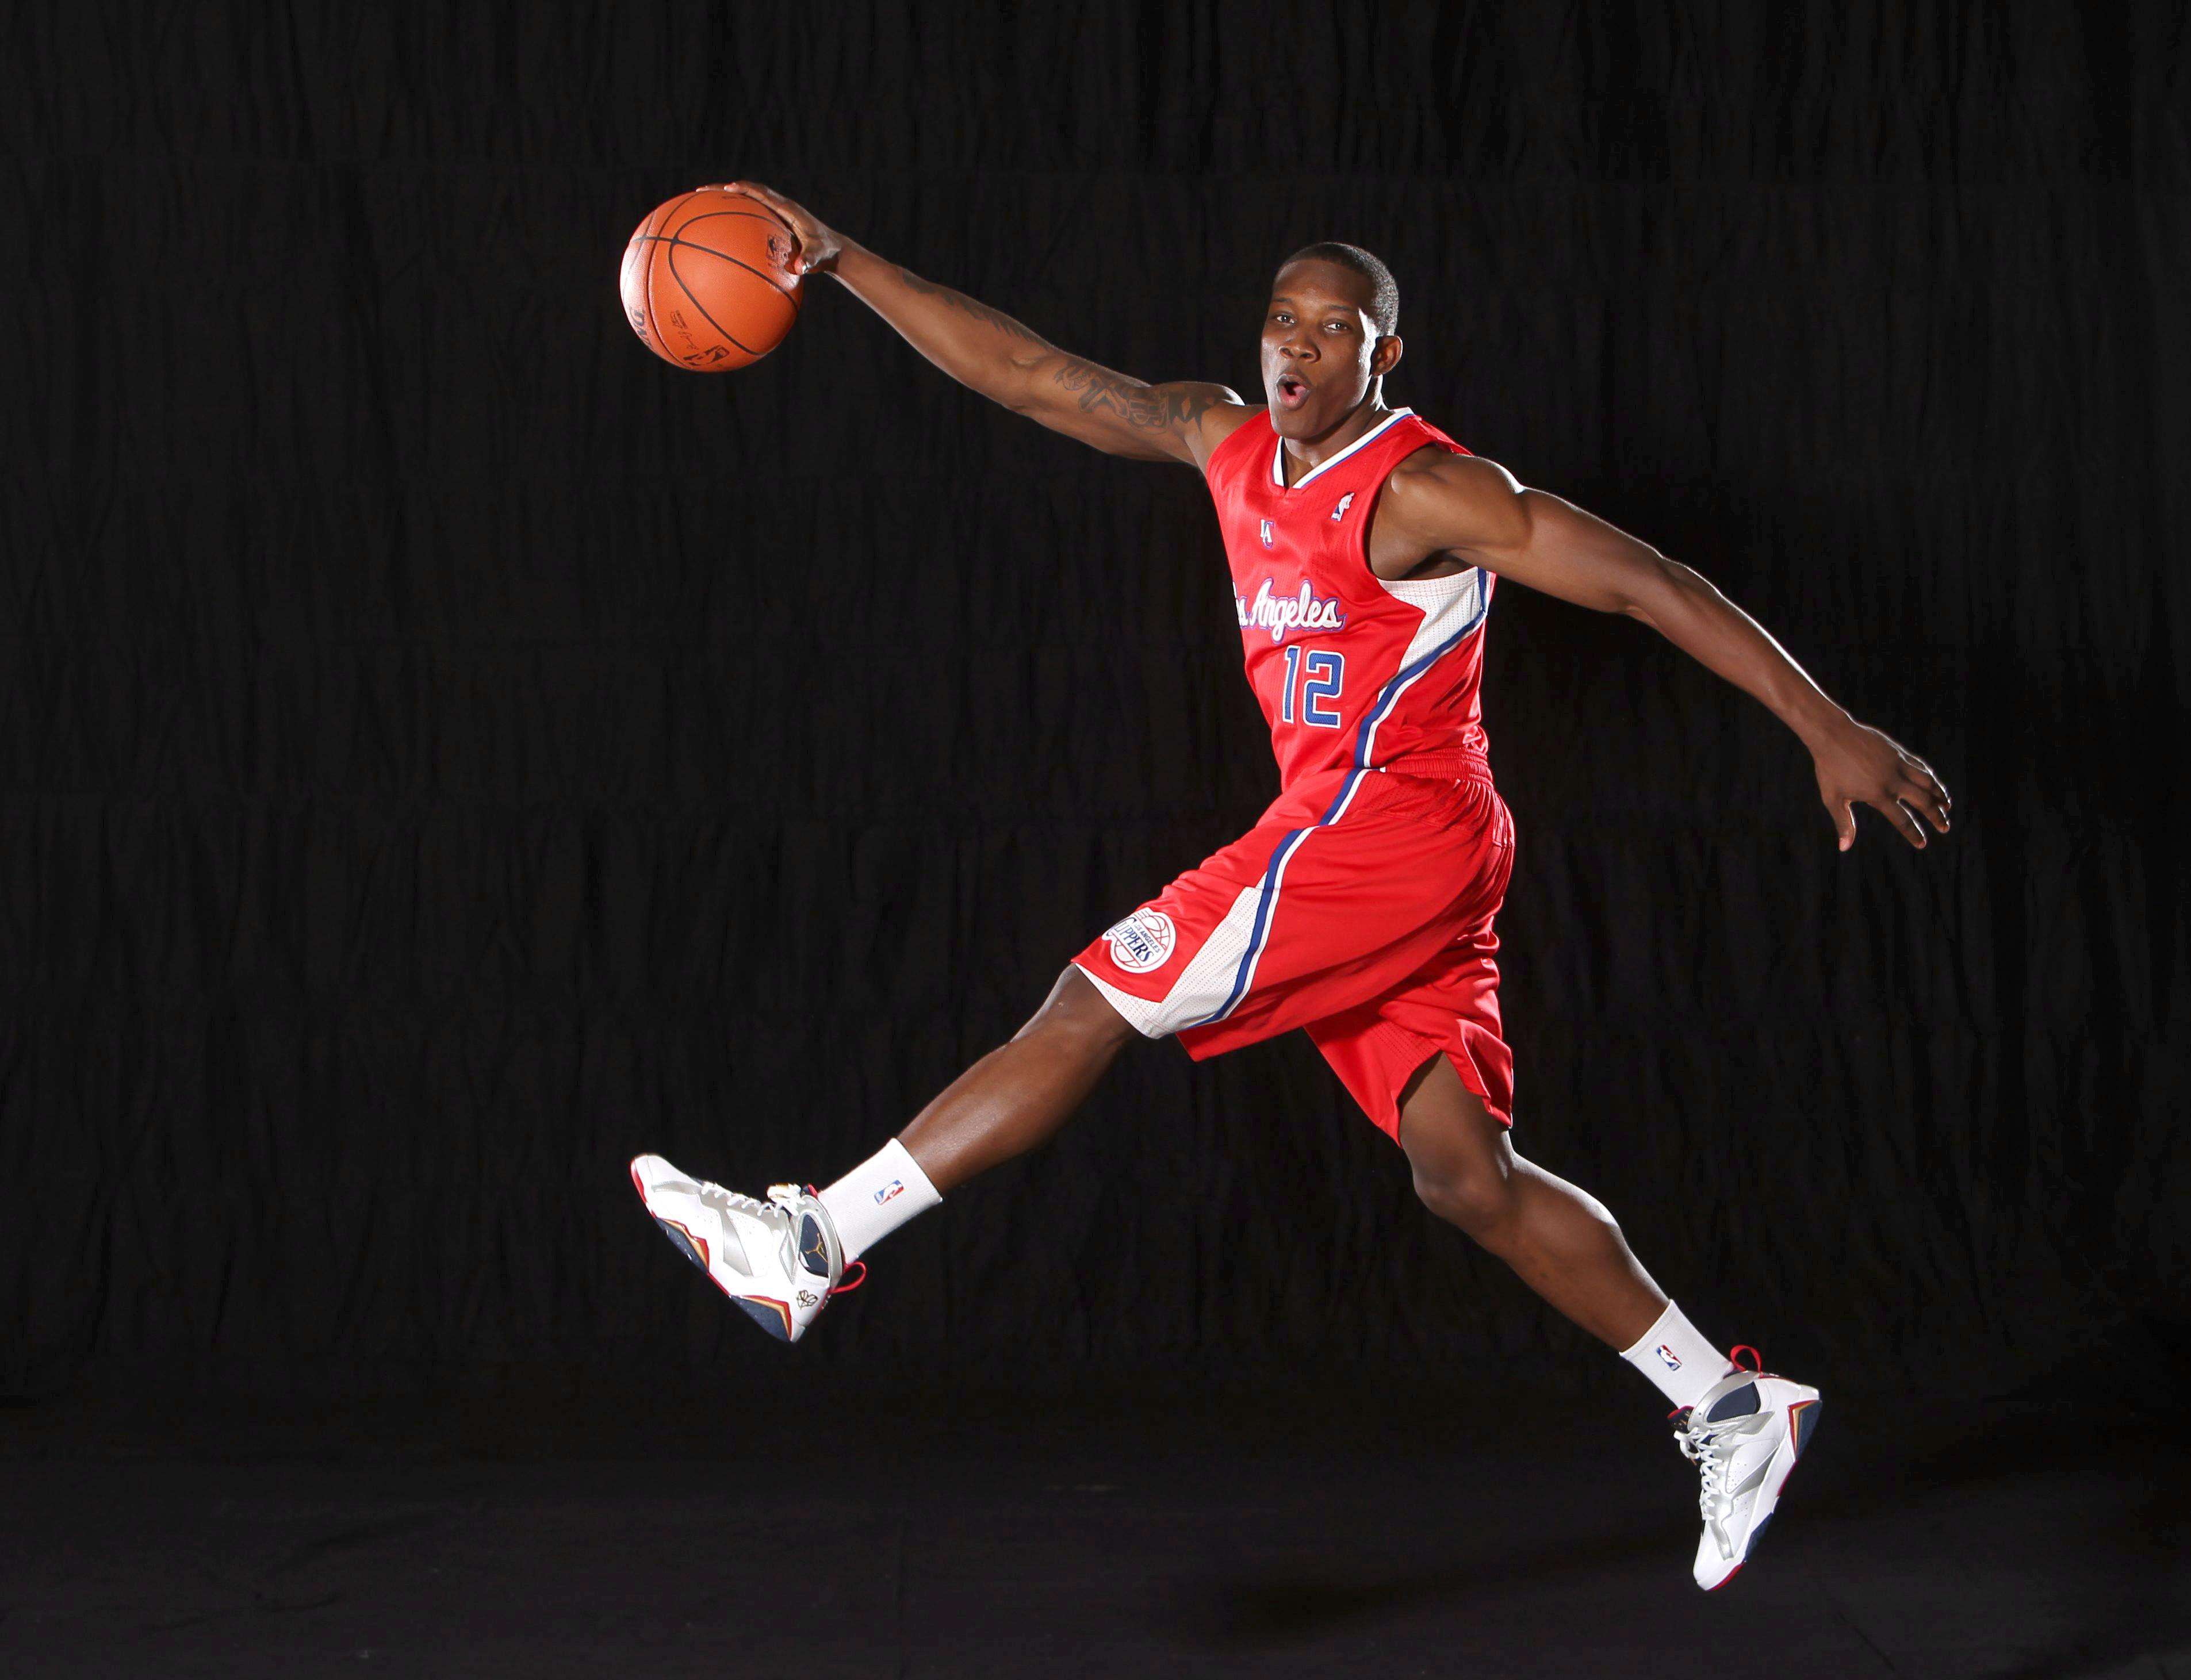 2010 NBA Rookie Photo Shoot